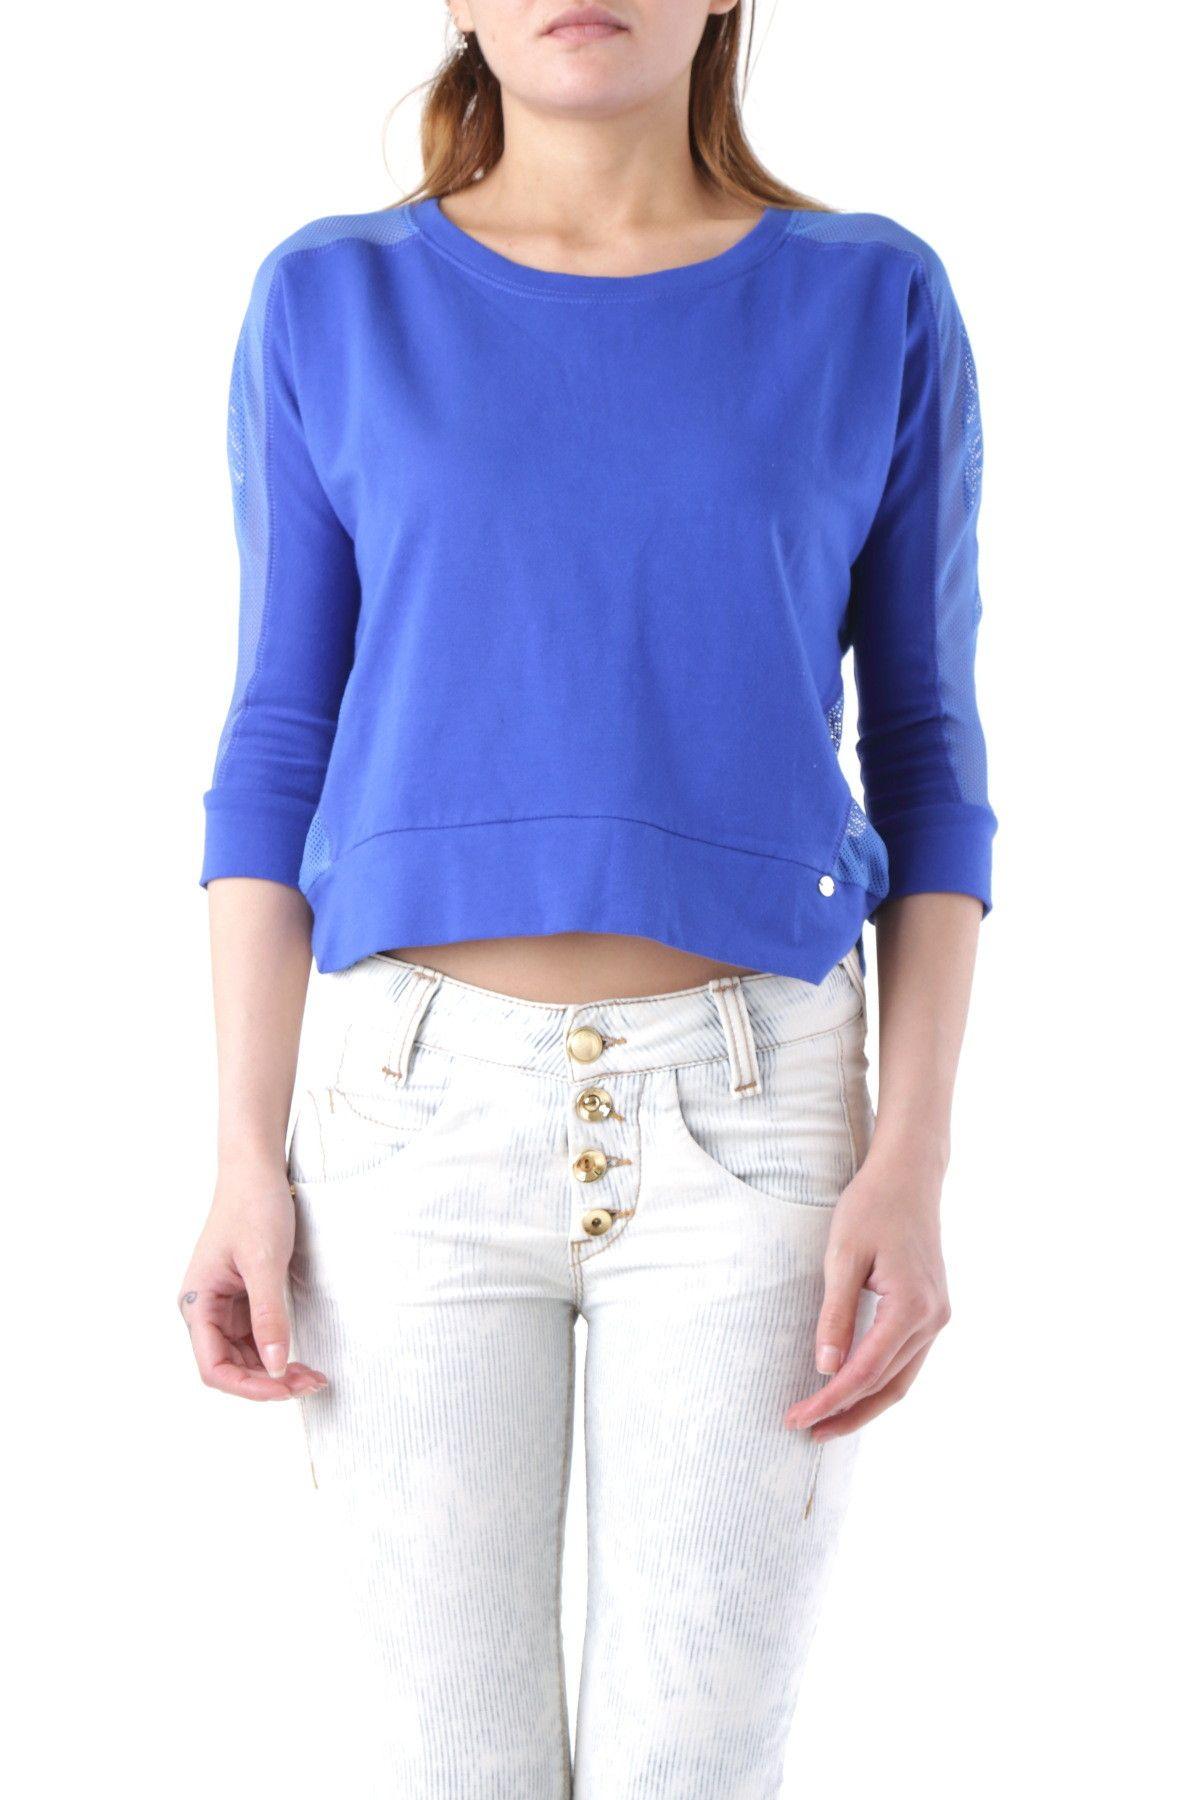 Fornarina Women's Sweatshirt In Blue